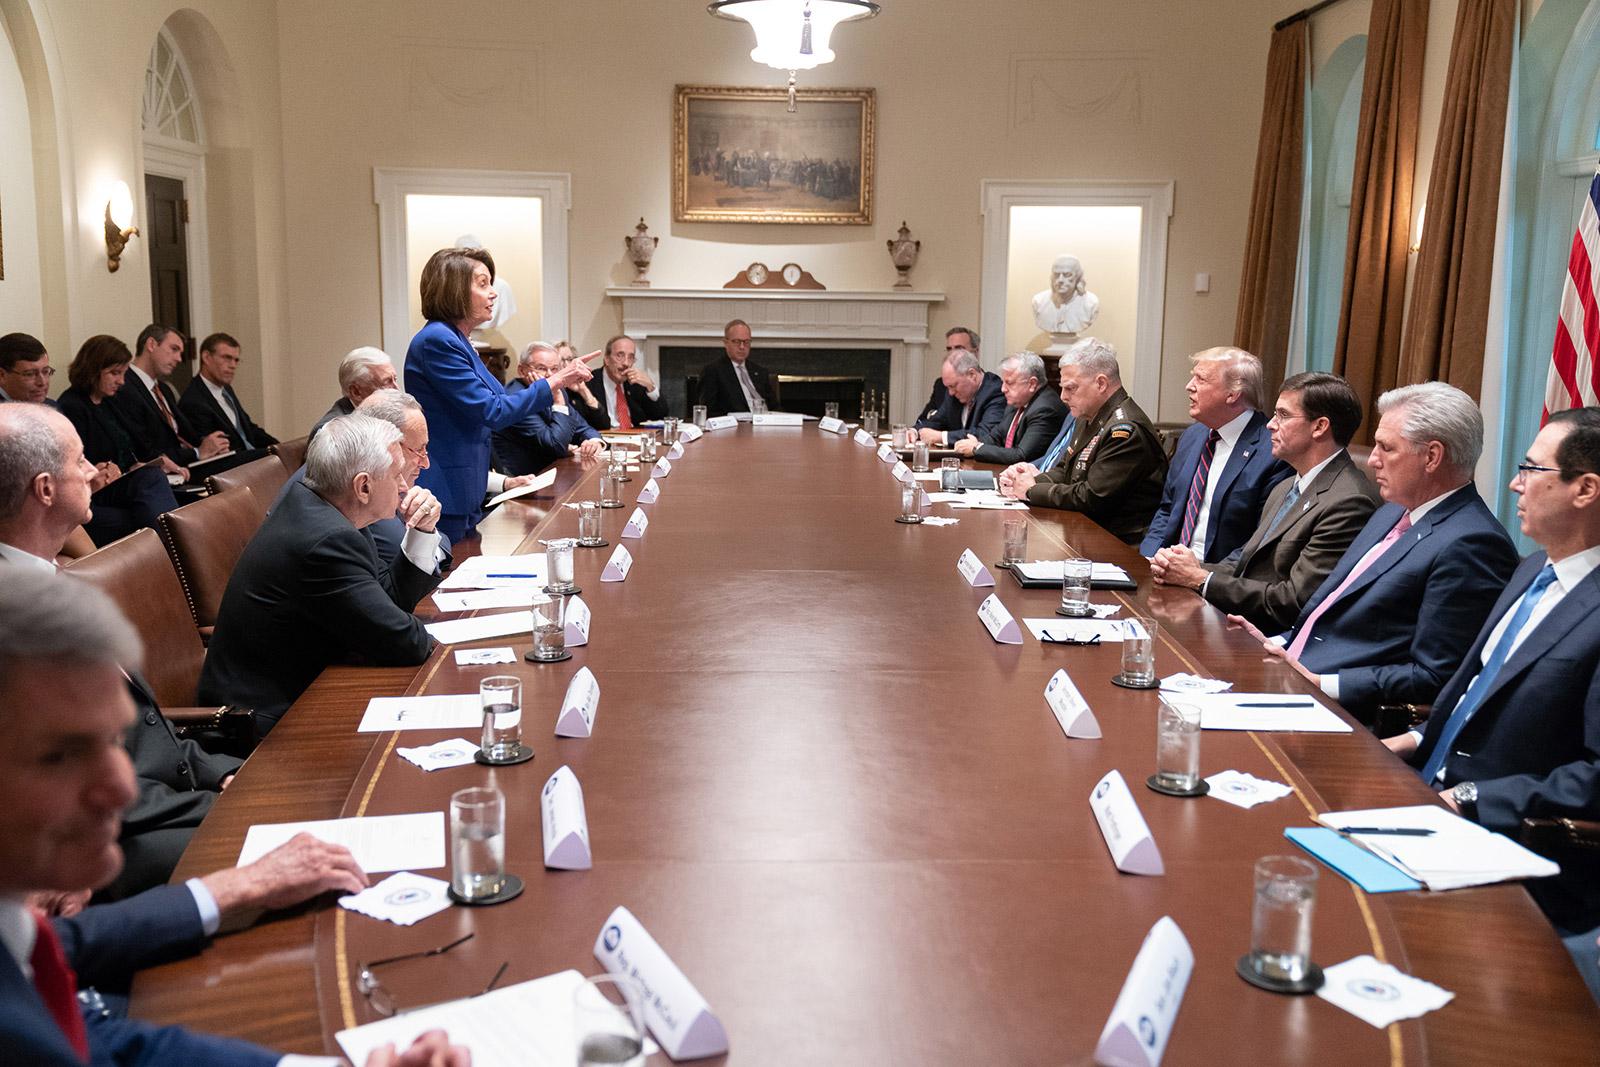 Shealah Craighead/The White House/Getty Images